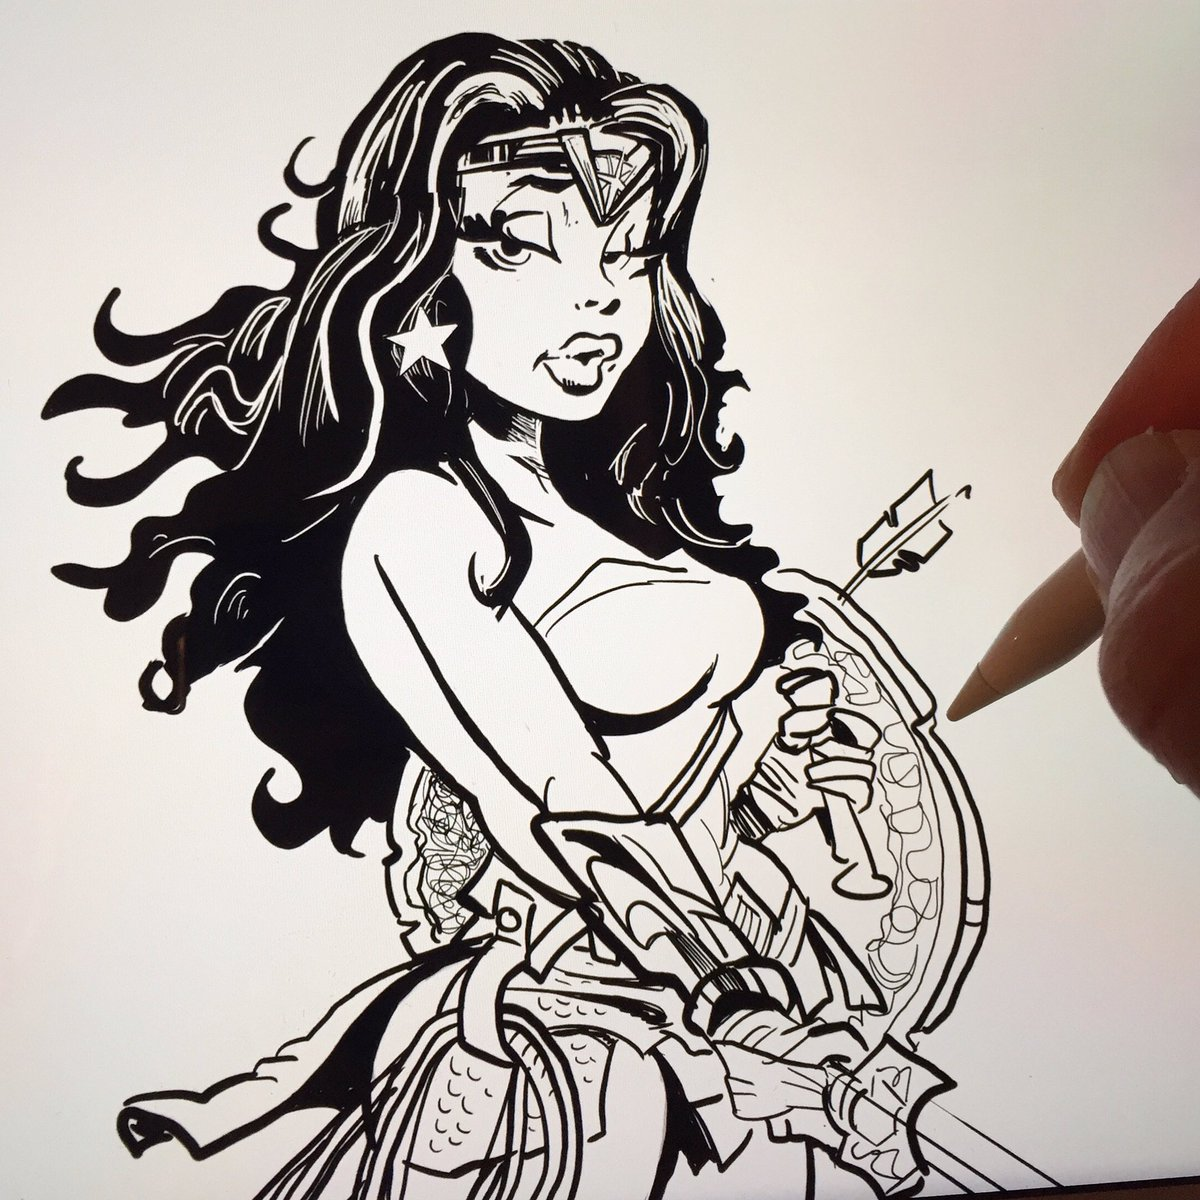 yeo cartoons on twitter sketching wonder woman cartoon sketch wonderwoman ink drawing smile dc comics amazon httpstcoo0kekmukcr